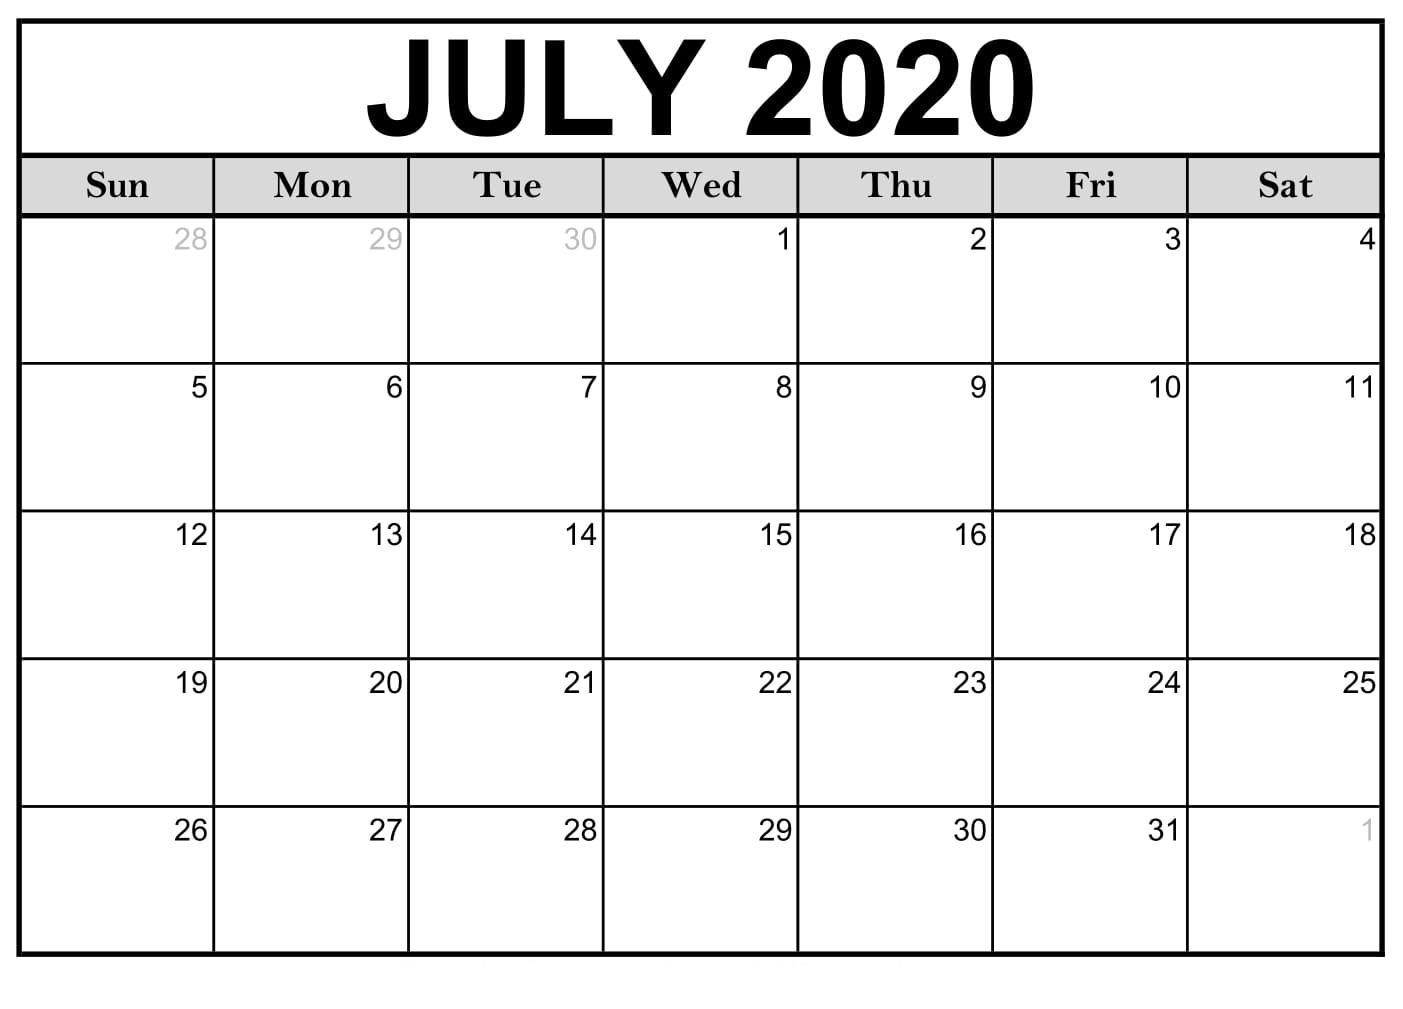 Free Printable July 2020 Calendar - Editable Templates